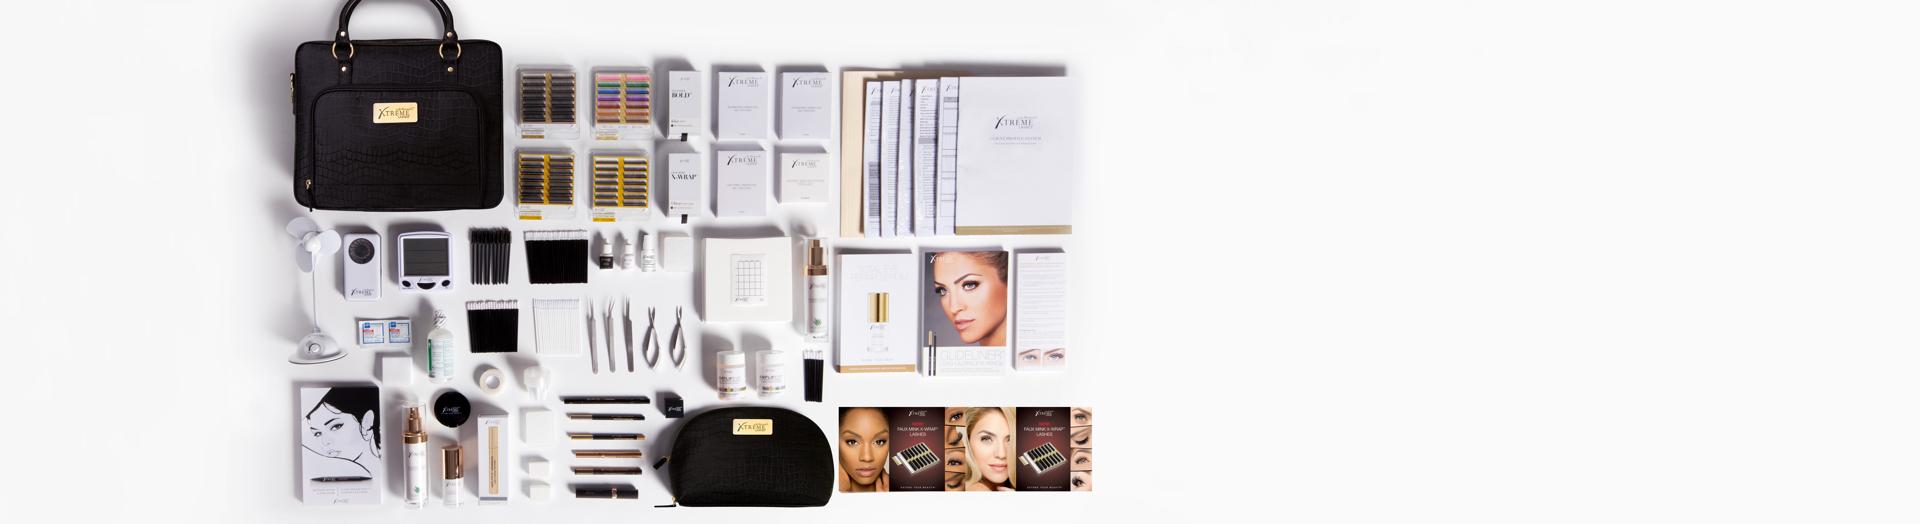 Explore Our Eyelash Extension Kit Xtreme Lashes